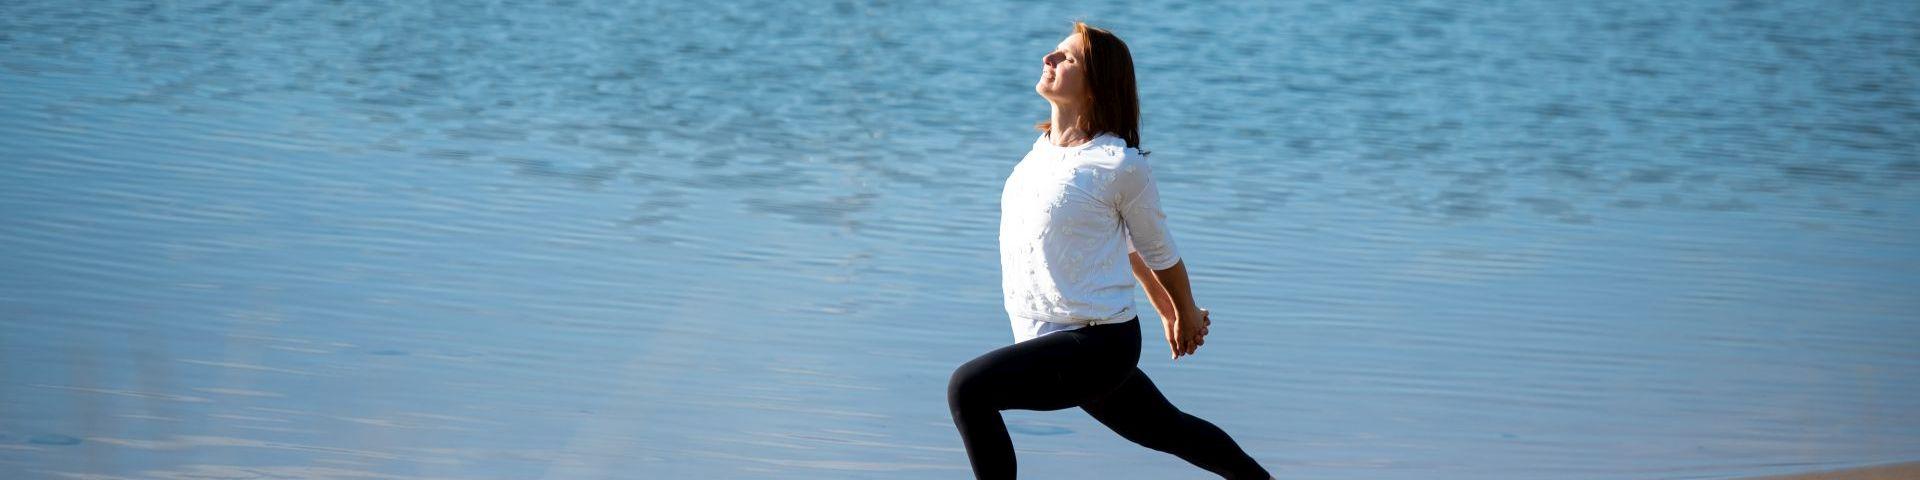 yoga_core_booster - Banner_Leefstijlcoach-Wageningen-Ede-Bennekom-yoga-coaching-personal-training_DSC_1446